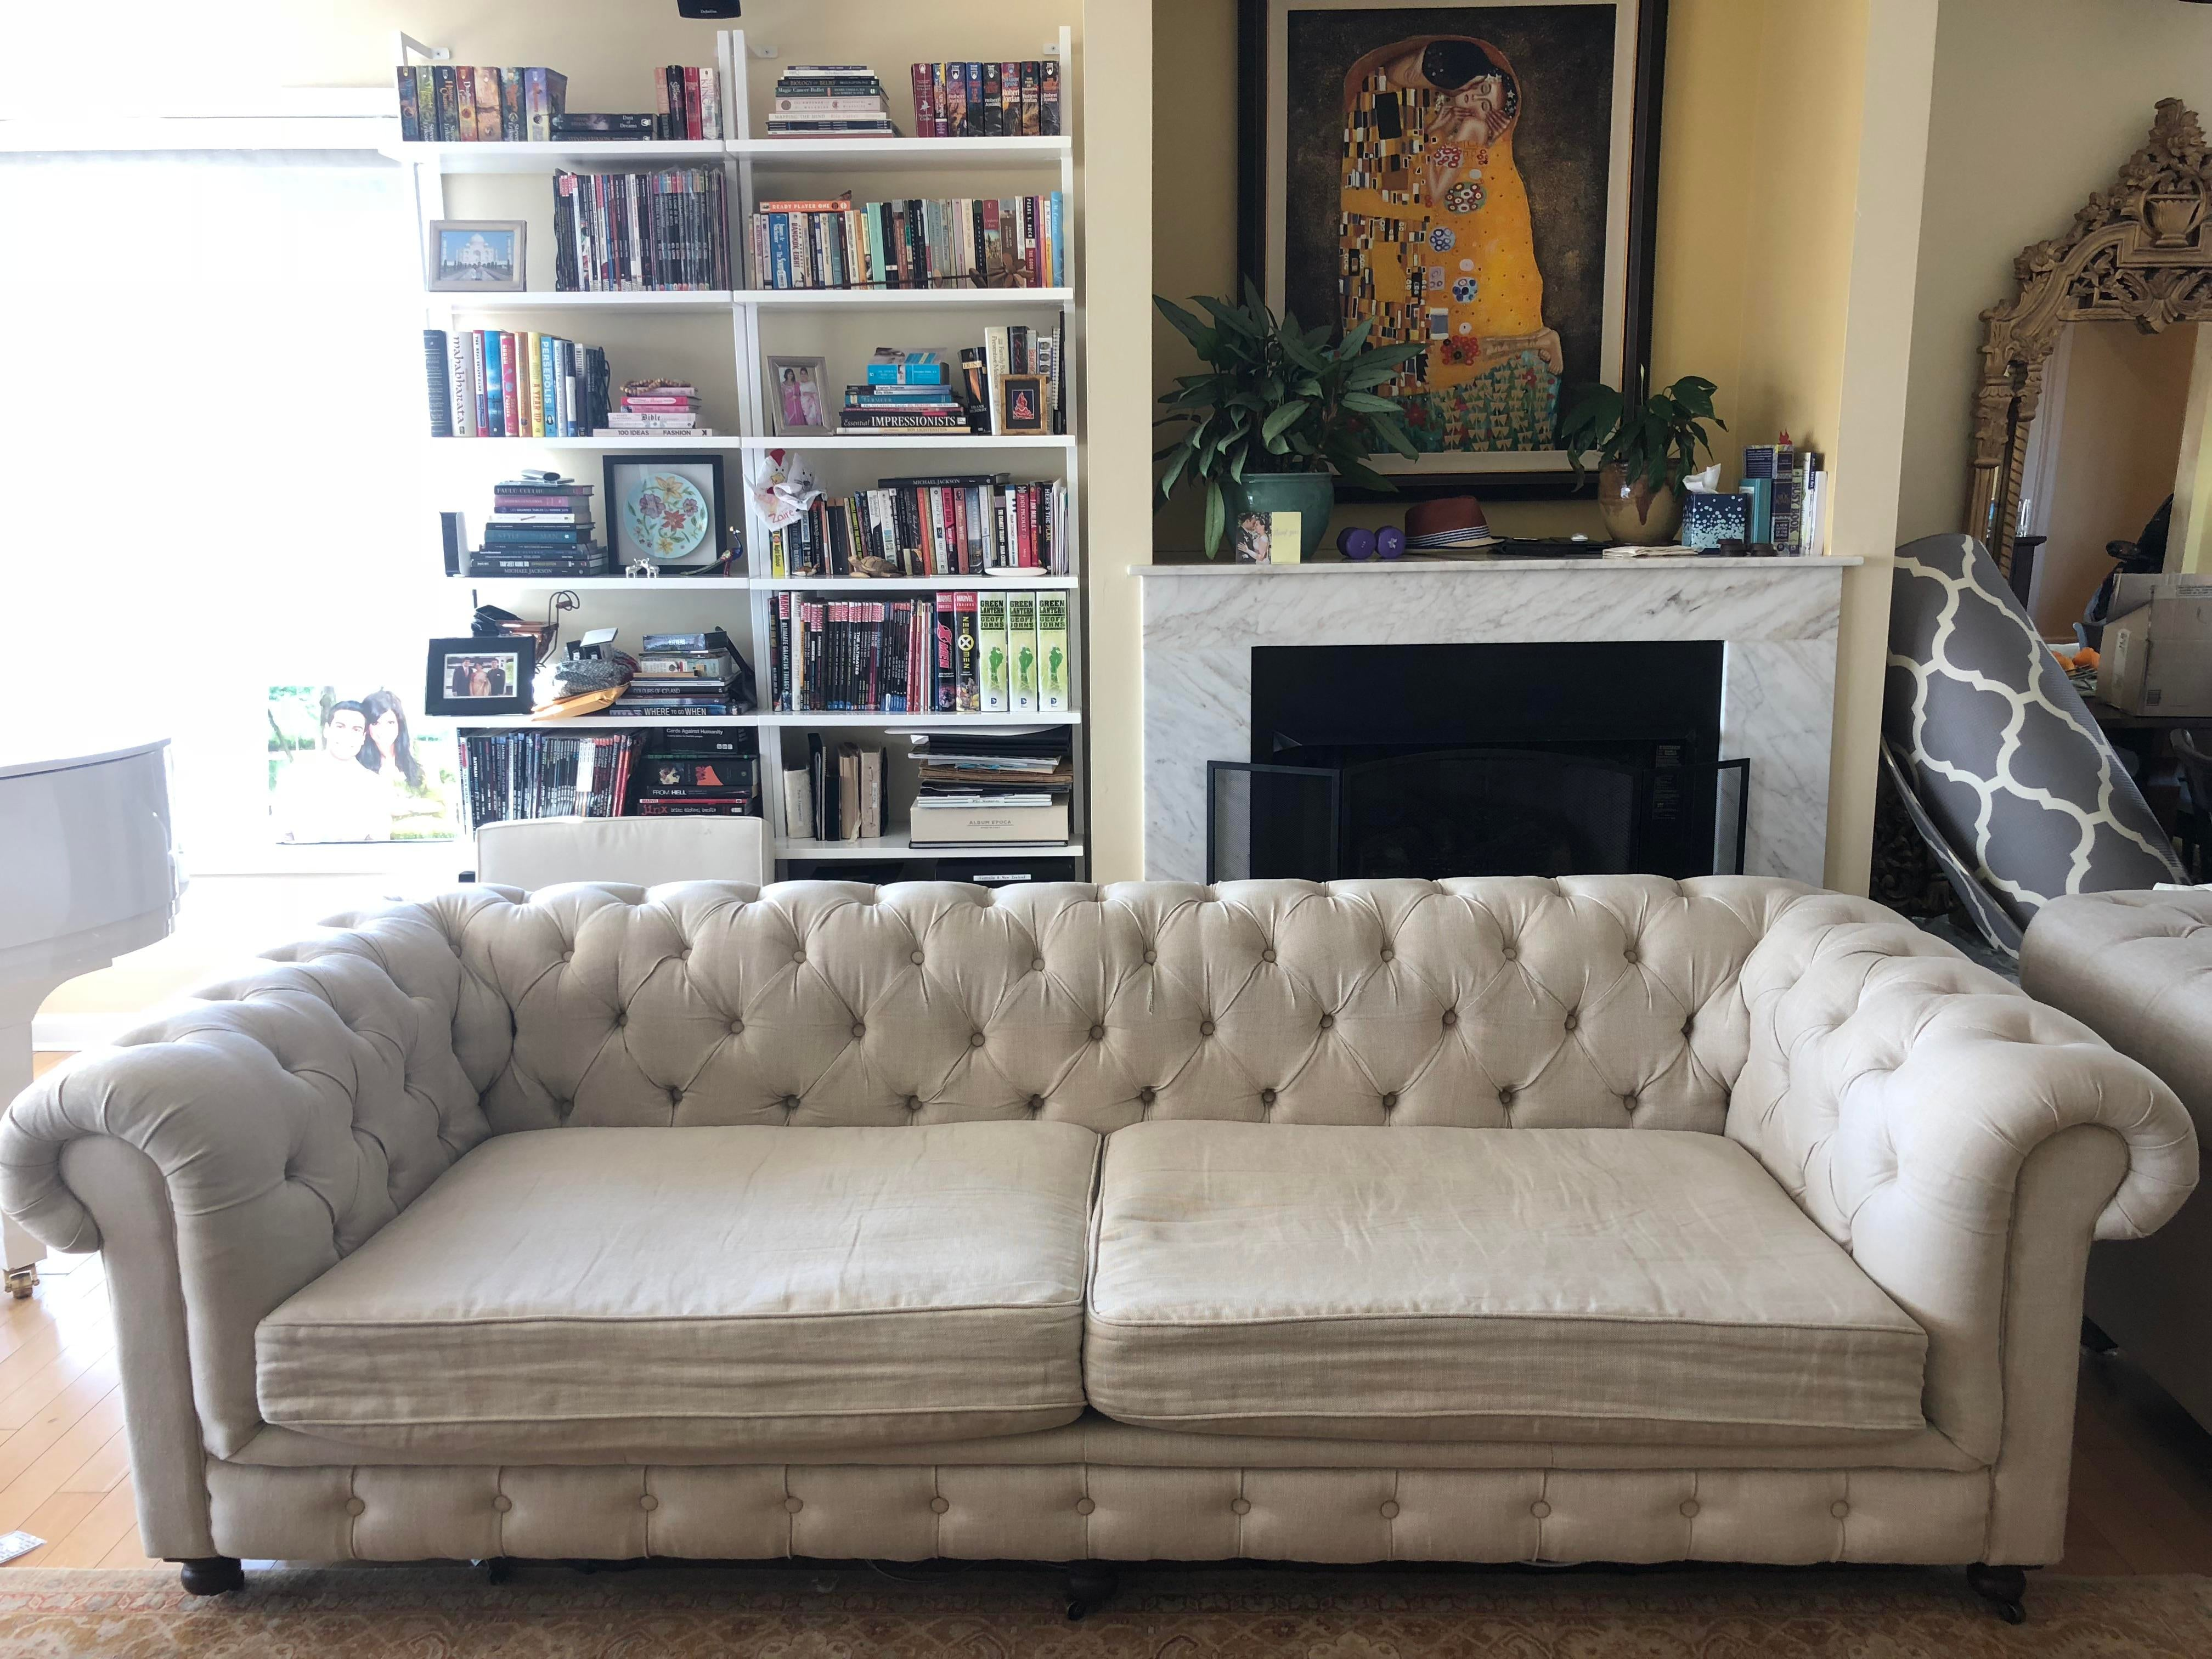 Exceptionnel Restoration Hardware 9u0027 Belgian Linen Luxe Kensington Sofa For Sale In New  York   Image